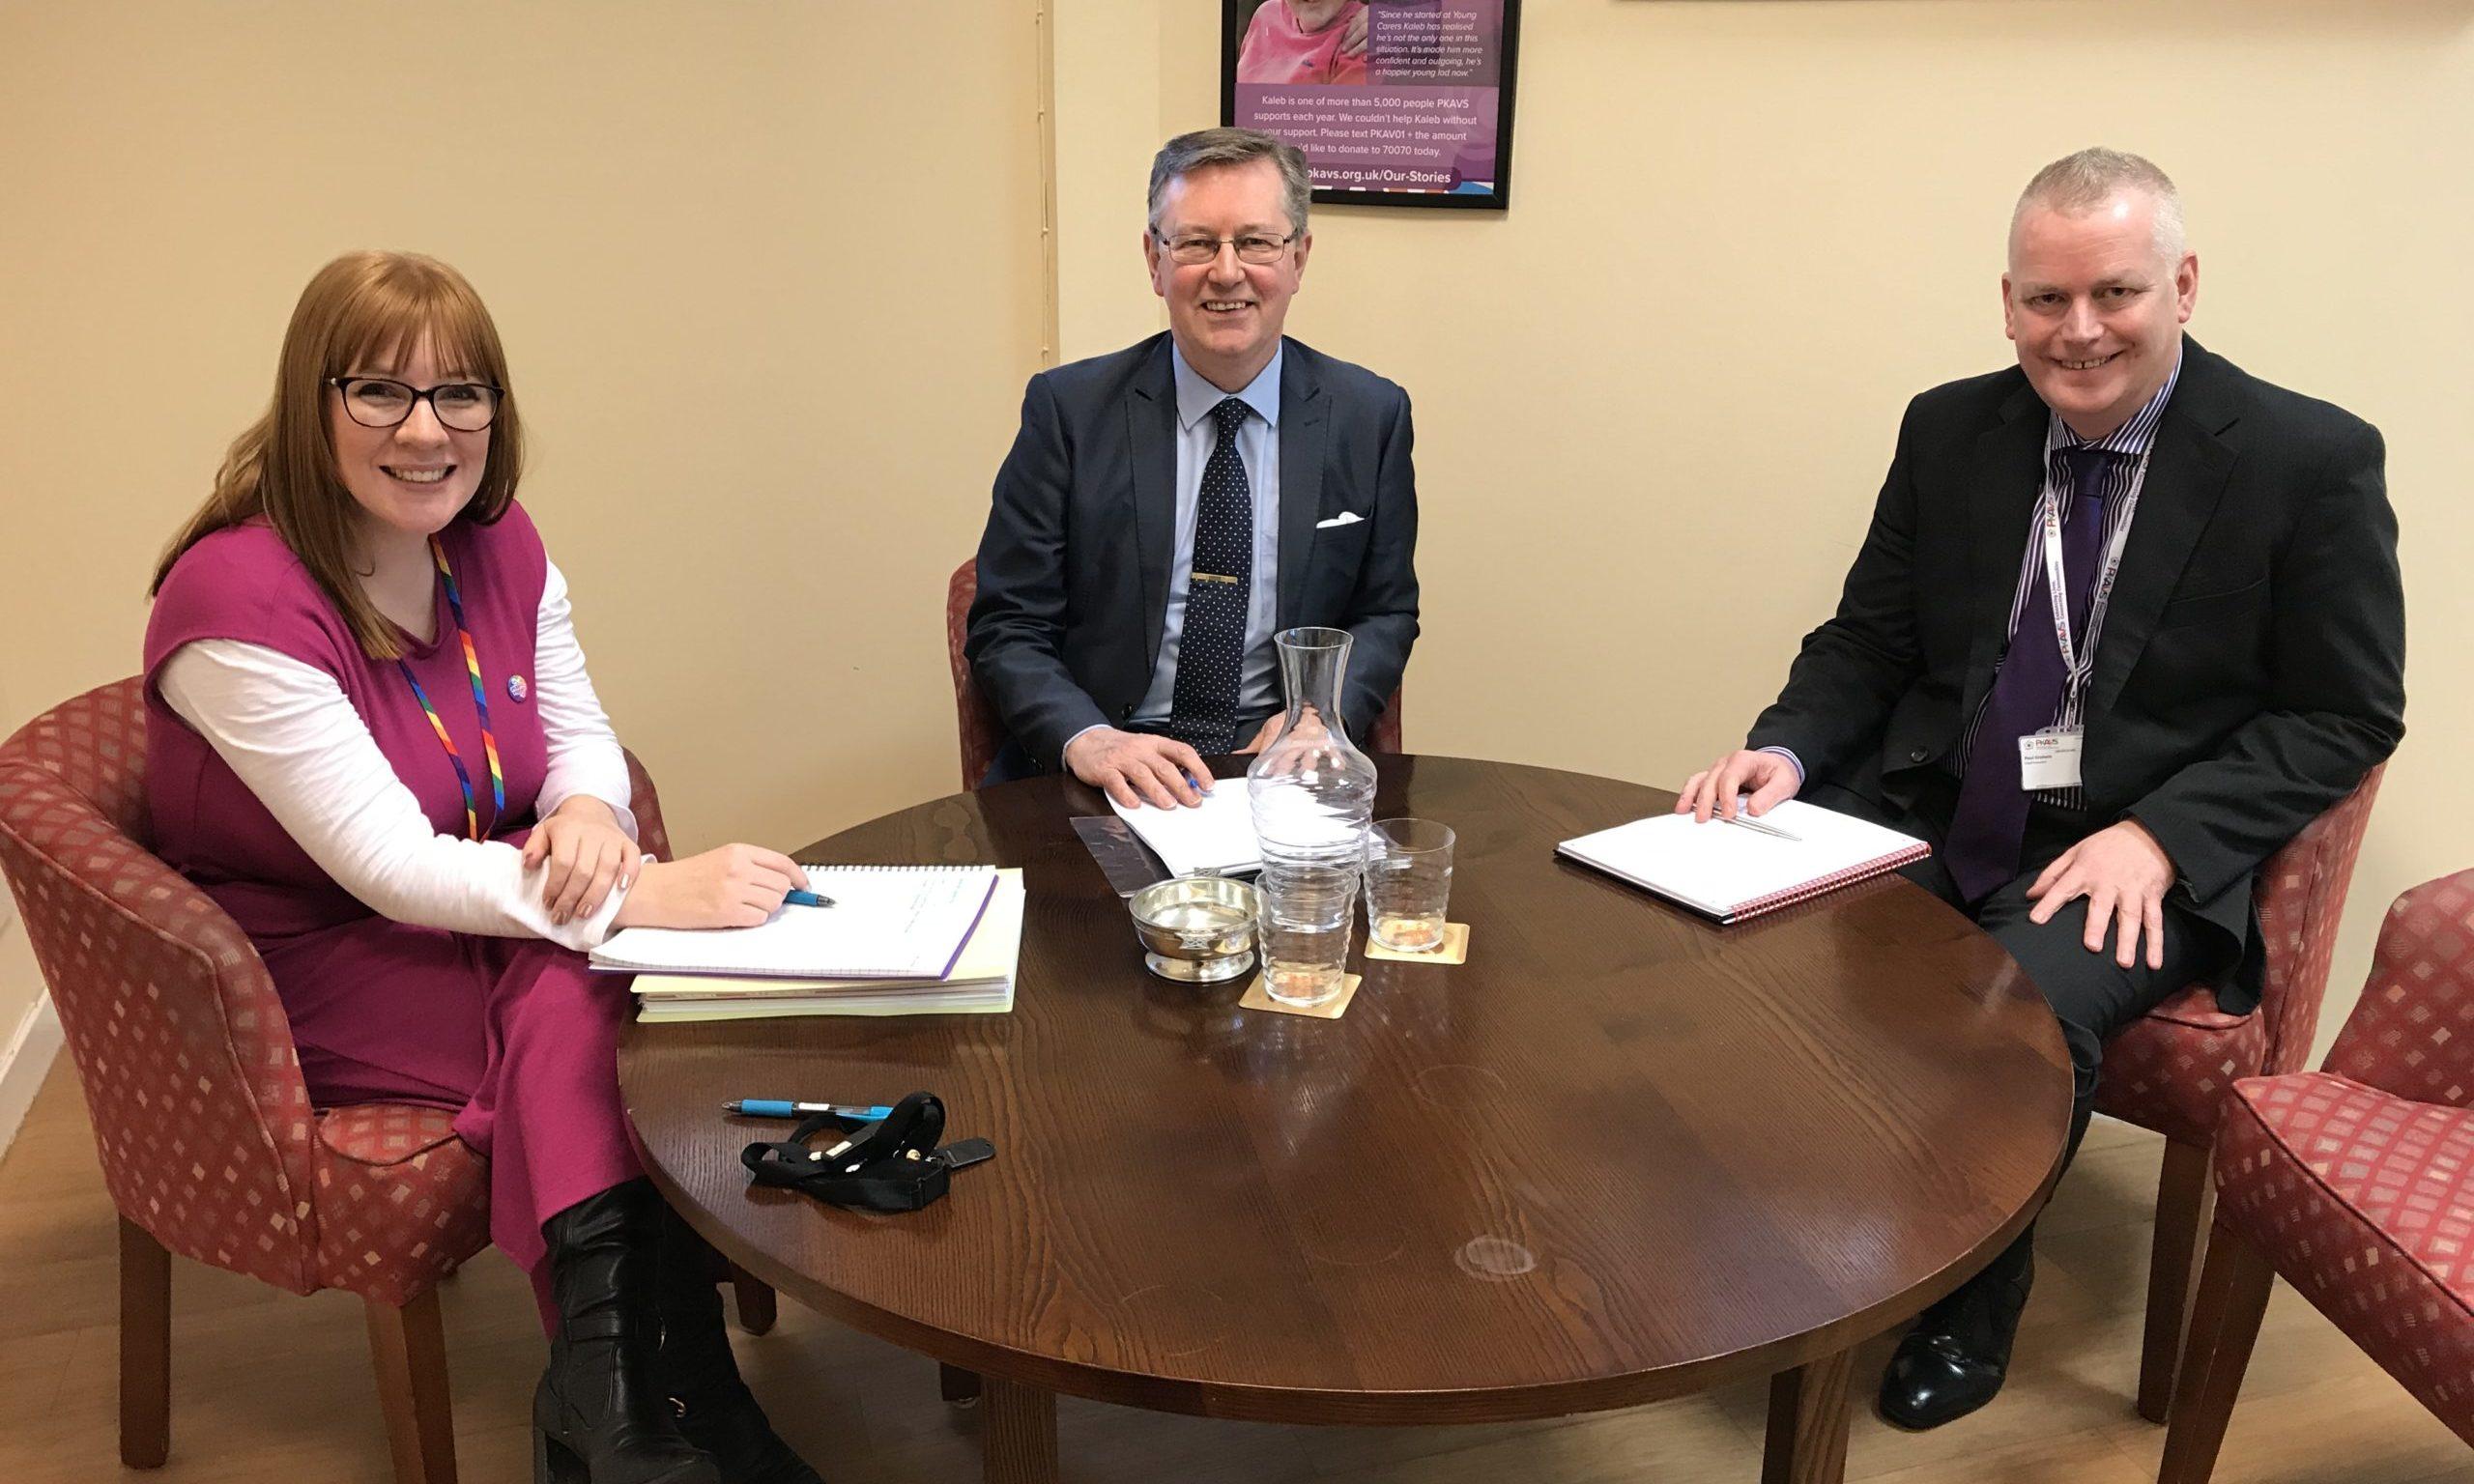 Lori Hughes of PKAVS, Alexander Stewart MSP and Paul Graham